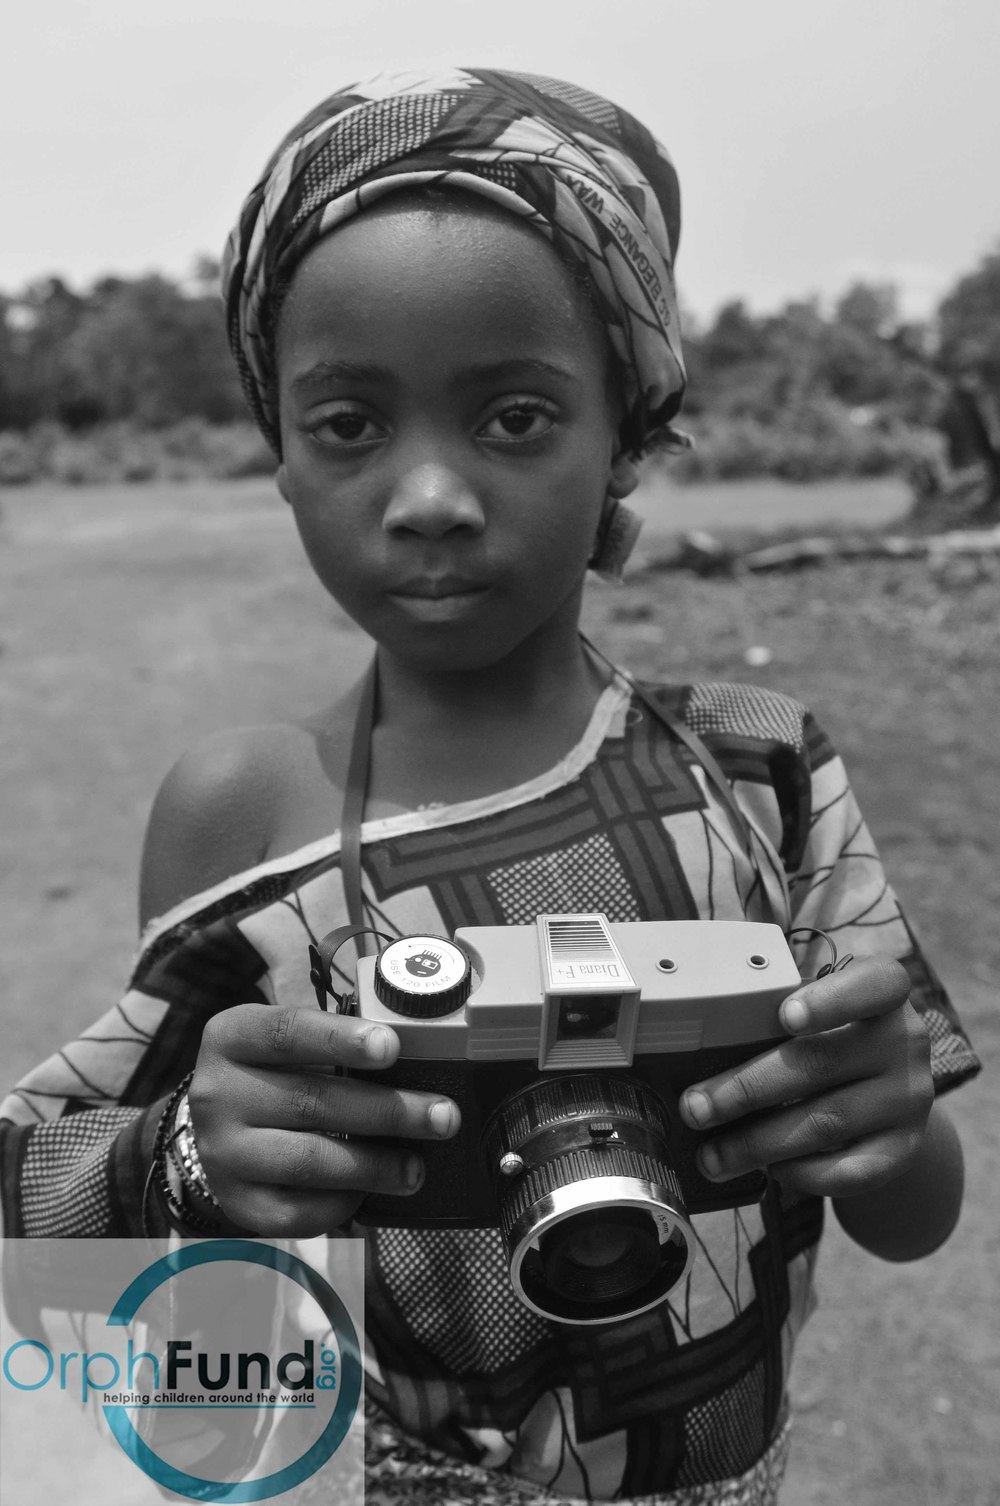 65 girl with camera copy - Copy.jpg